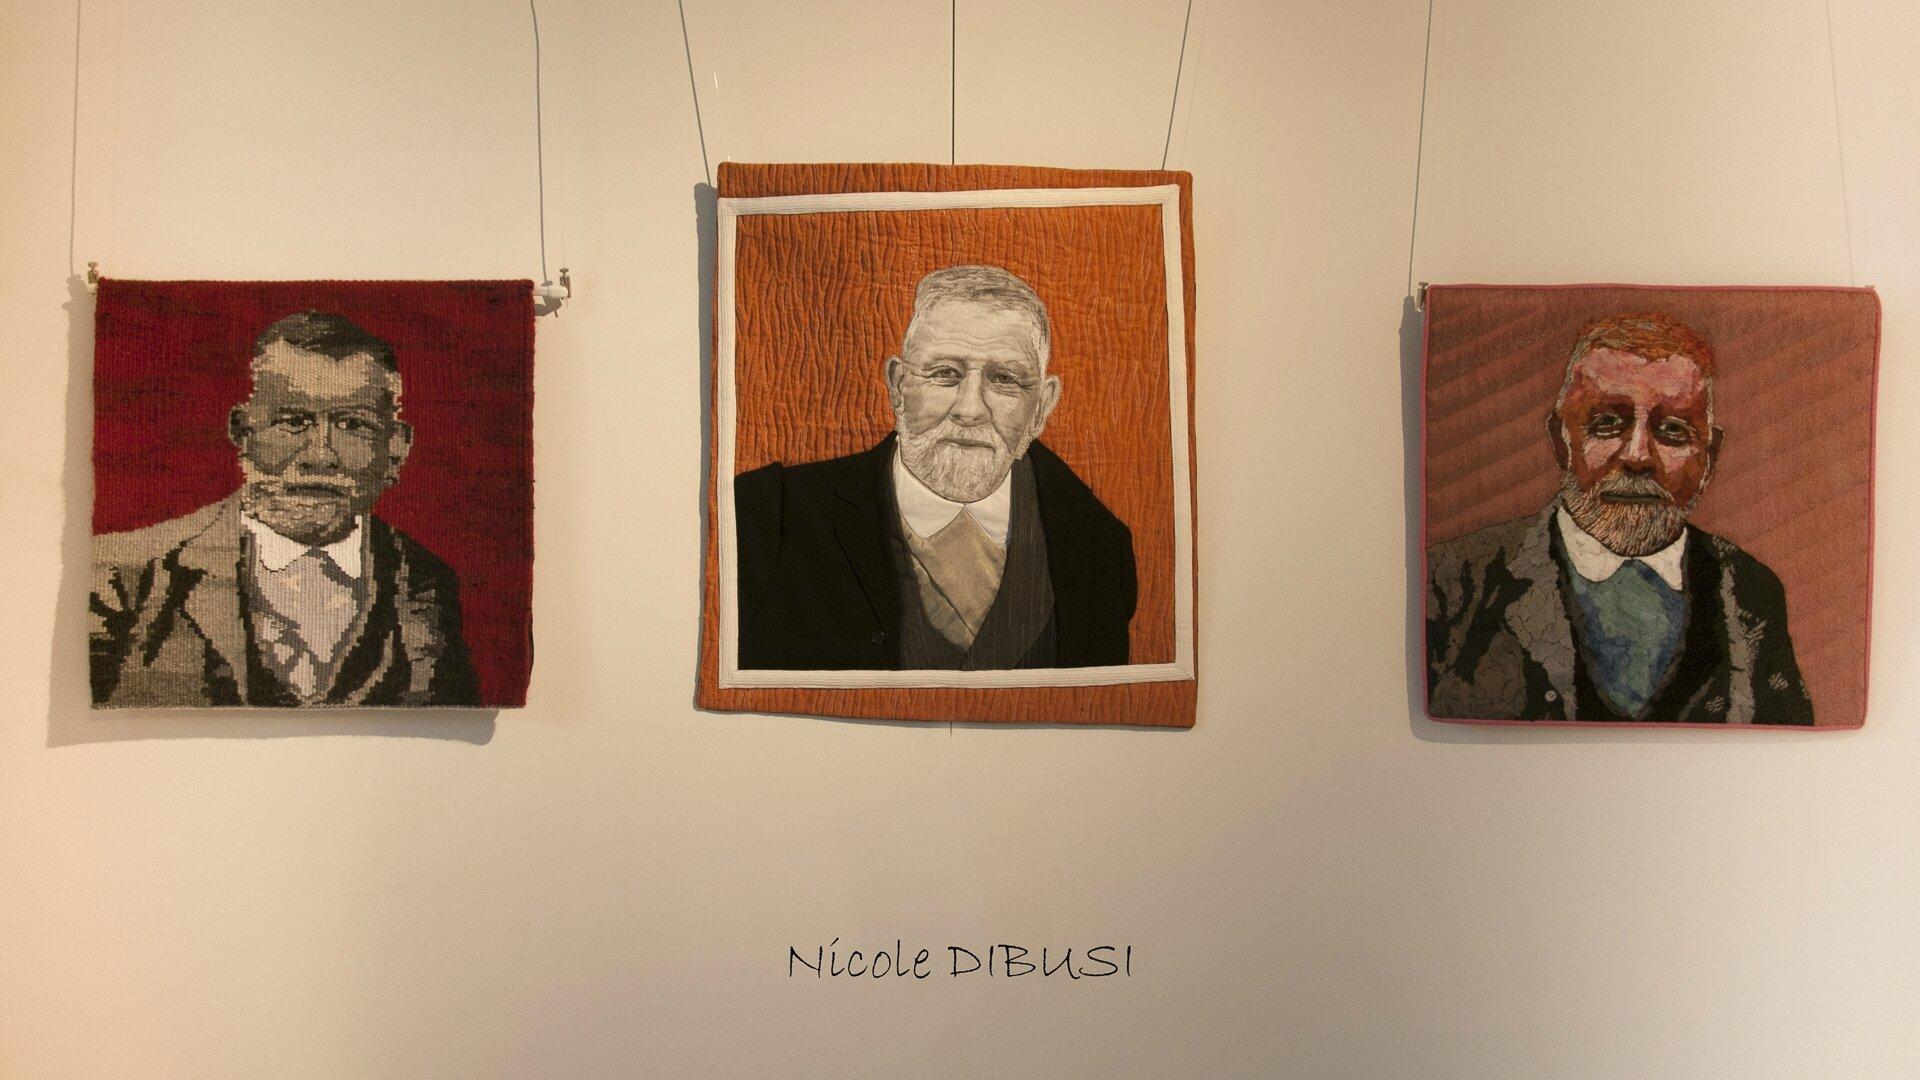 2016-05-21_17-48-17_Trait Portrait-Nicole DIBUSI-Modifier